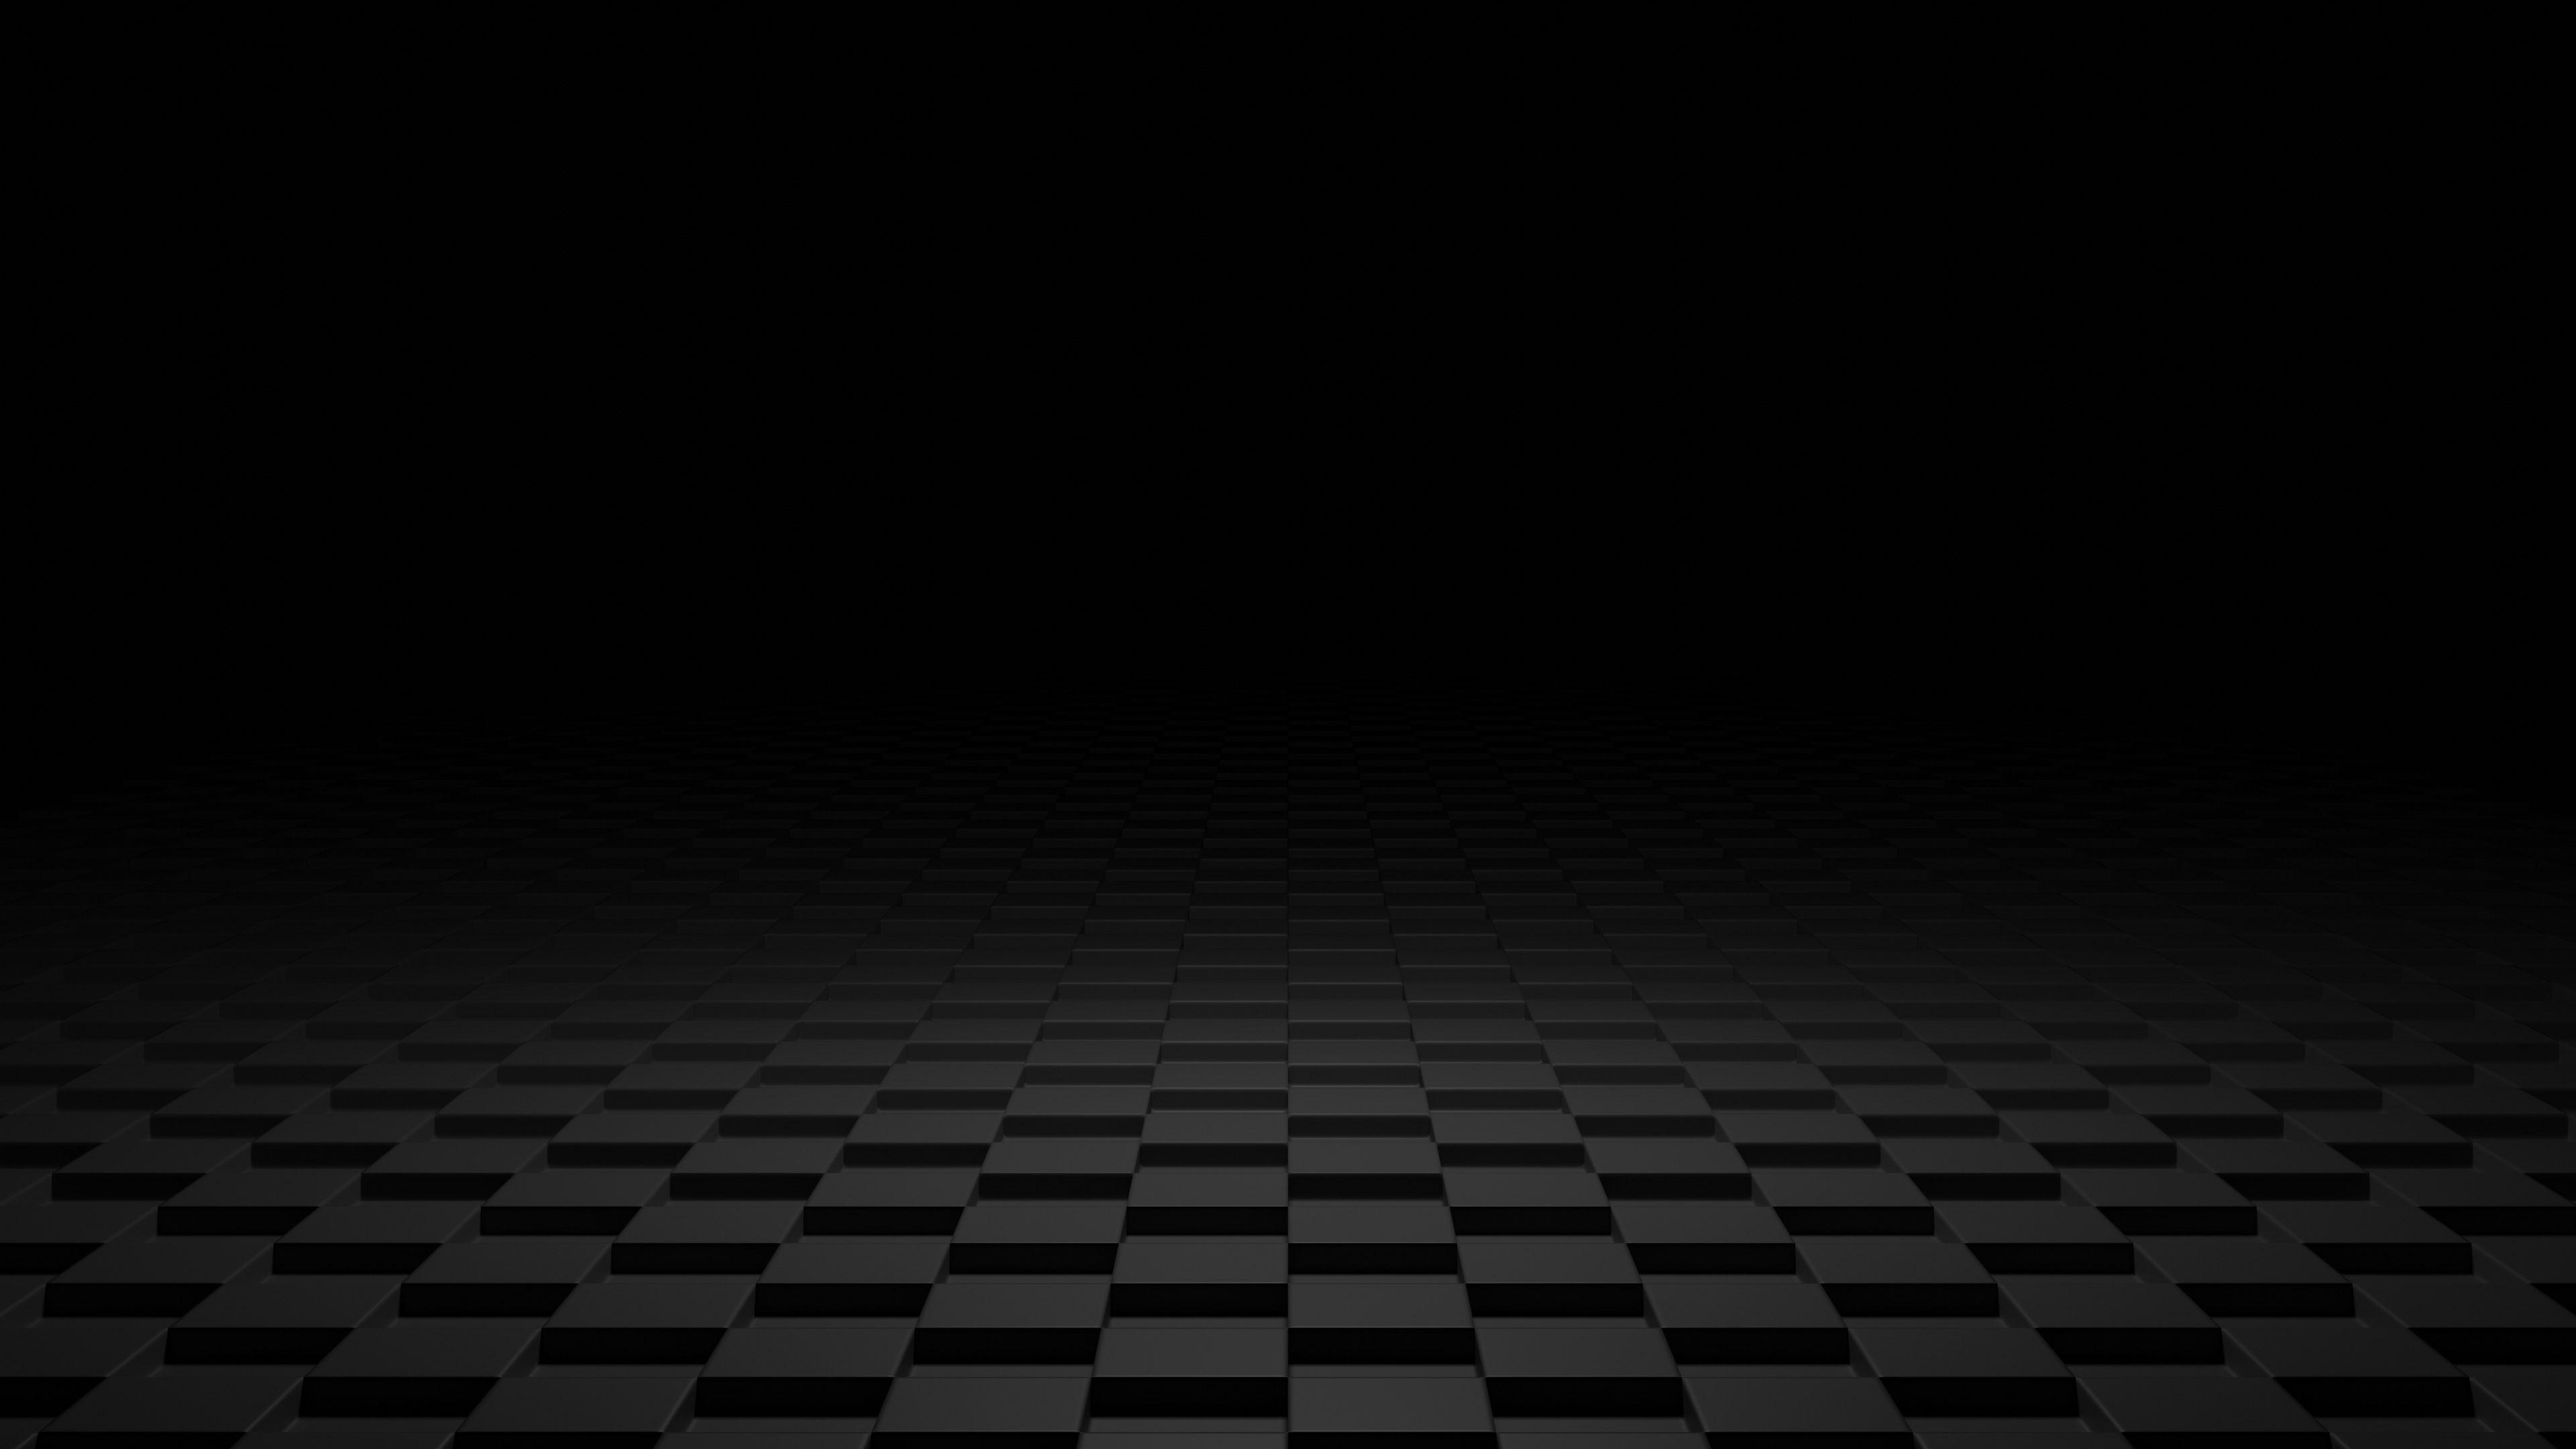 Dark 3d Shapes Floor Shapes Wallpapers Hd Wallpapers Dark Wallpapers Abstract Wallpapers 4k Wallpapers Dark Wallpaper Abstract Wallpaper Black Hd Wallpaper